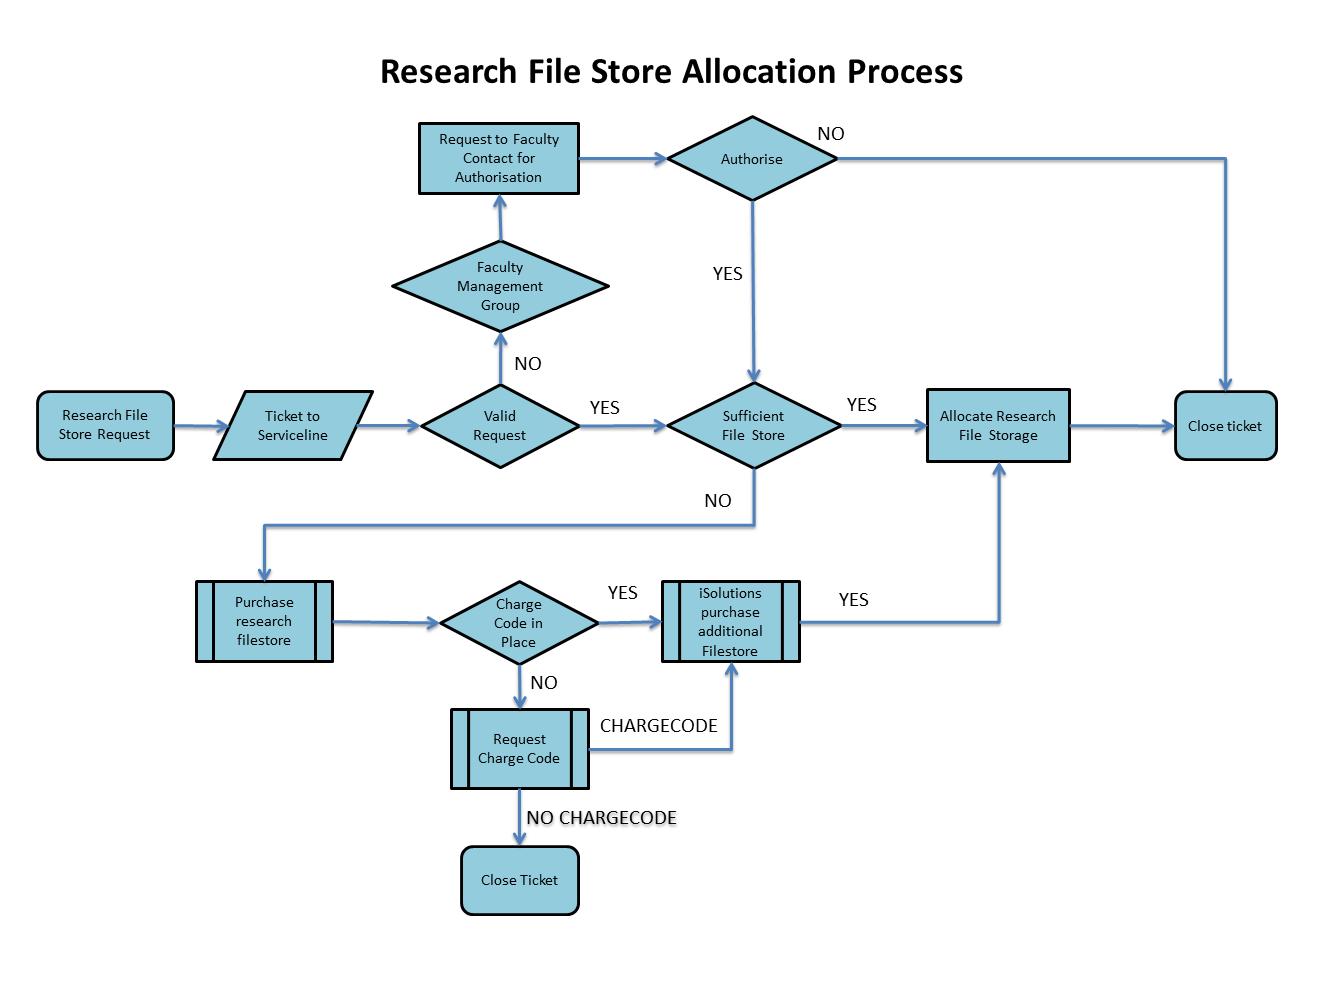 research file store request process